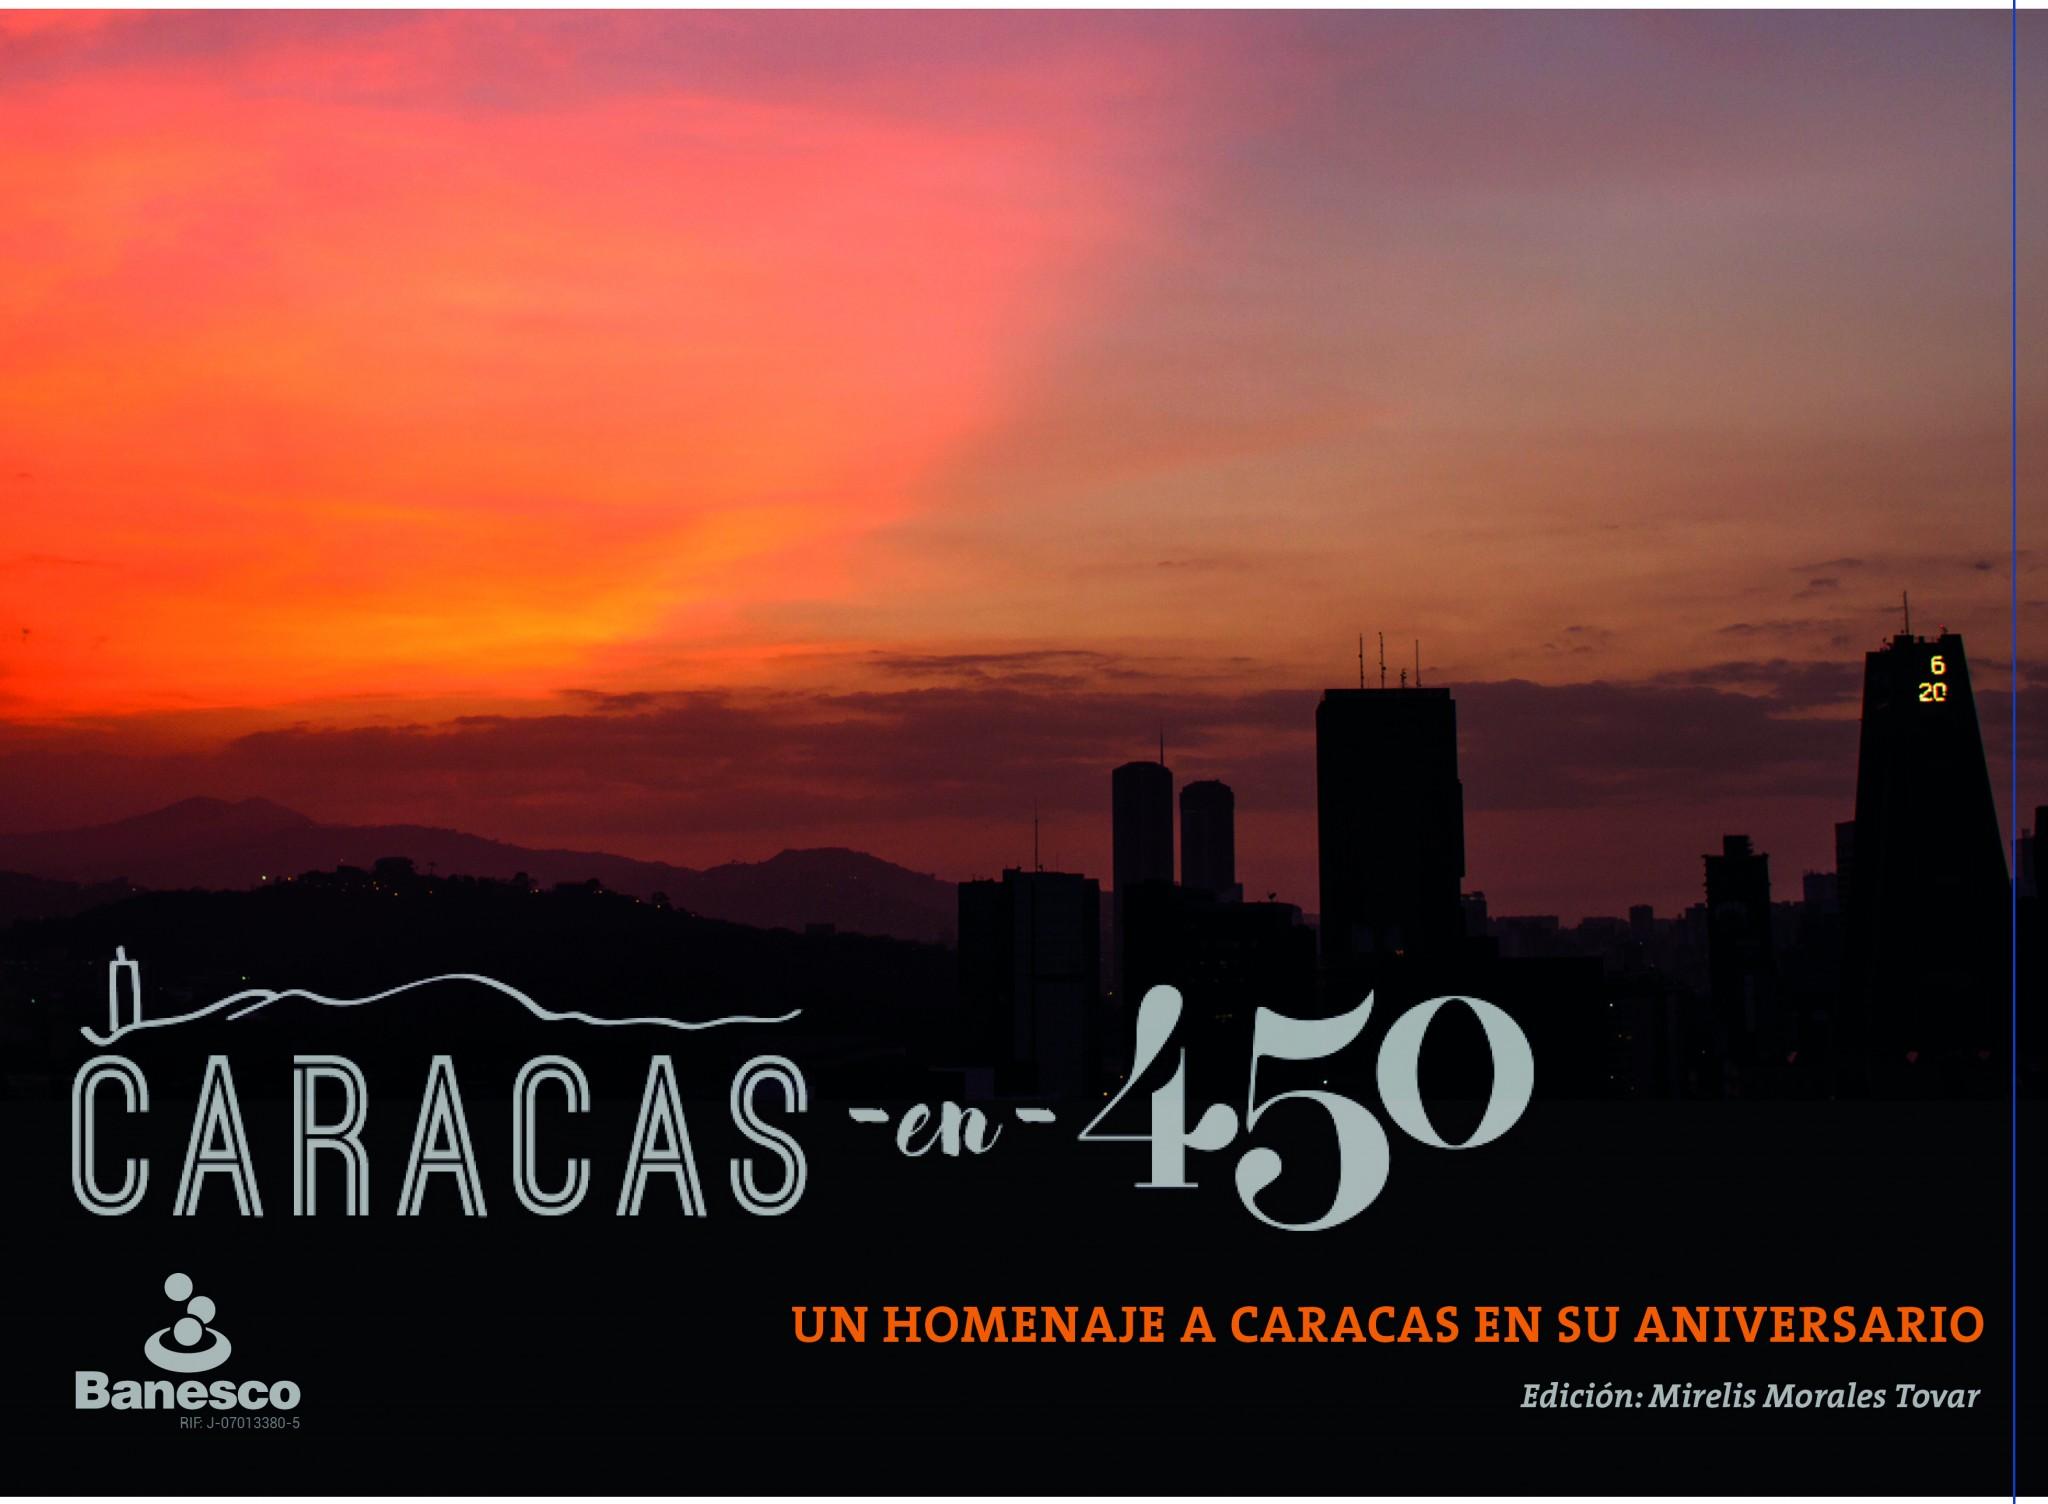 Caracasen 450